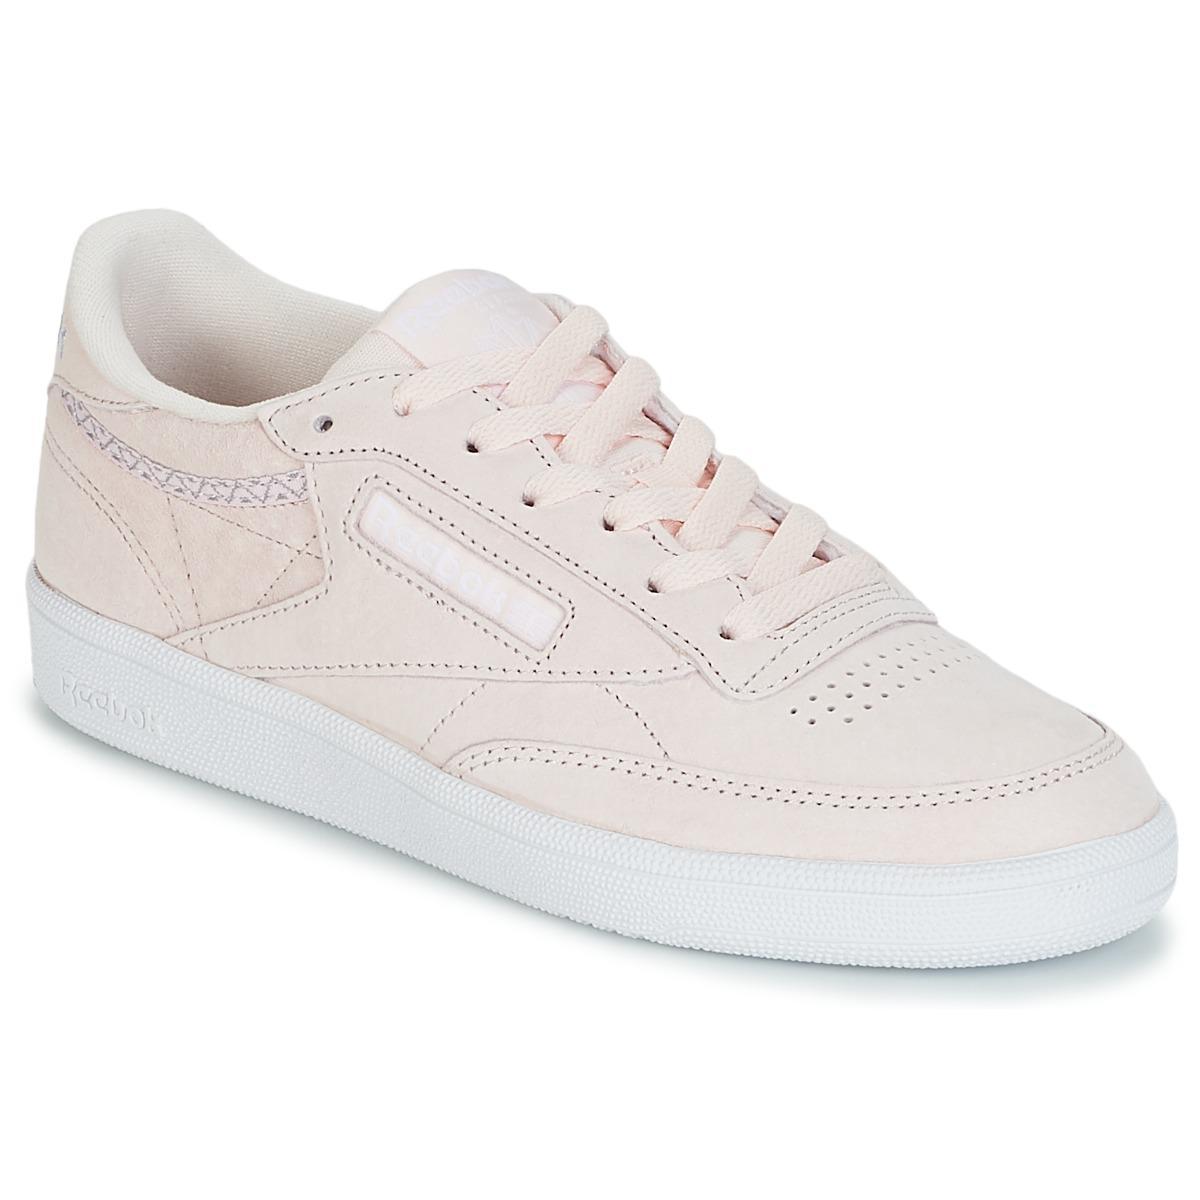 80db56b11c297 Reebok Club C 85 Trim Nbk Shoes (trainers) in Pink - Lyst